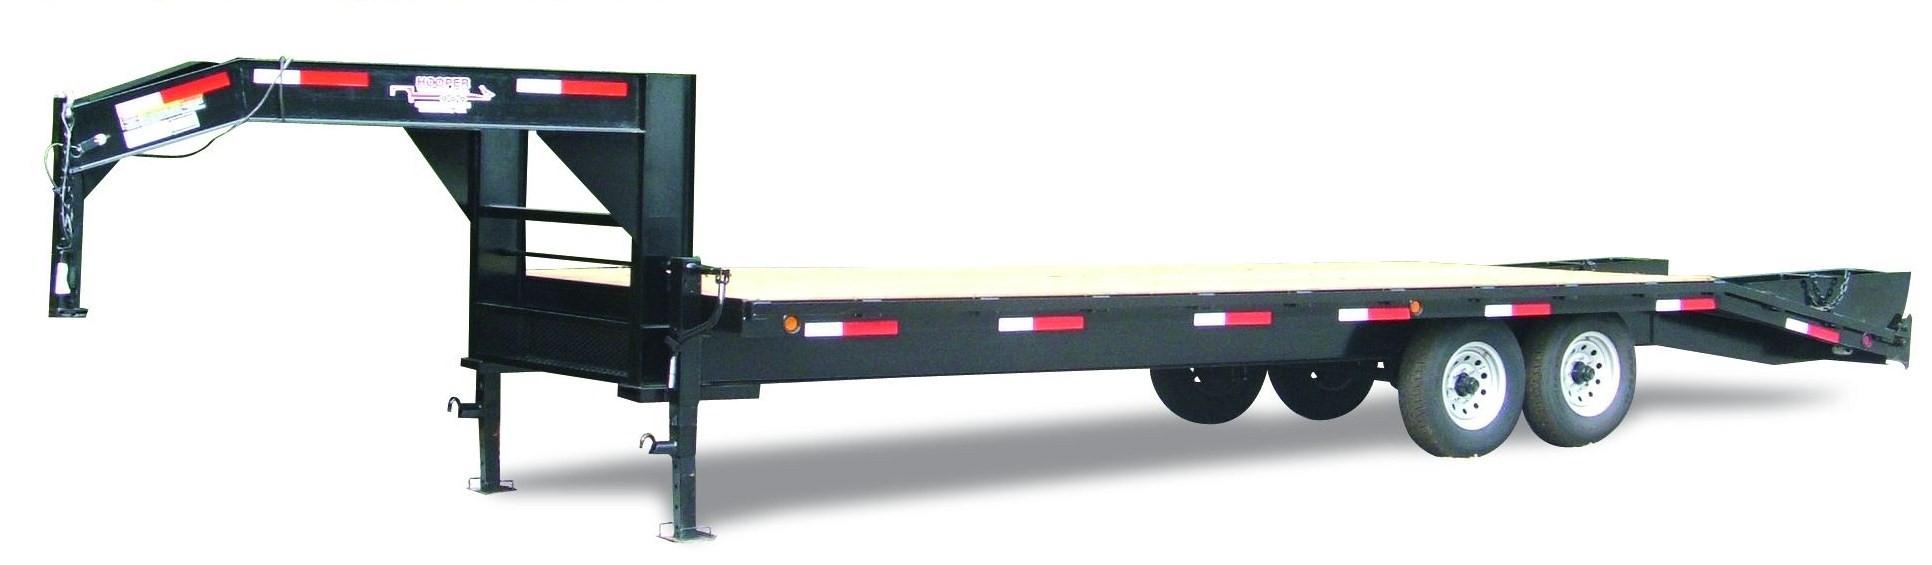 hooper trailer sales heavy duty gooseneck trailersHooper Trailer Wiring Diagram #15